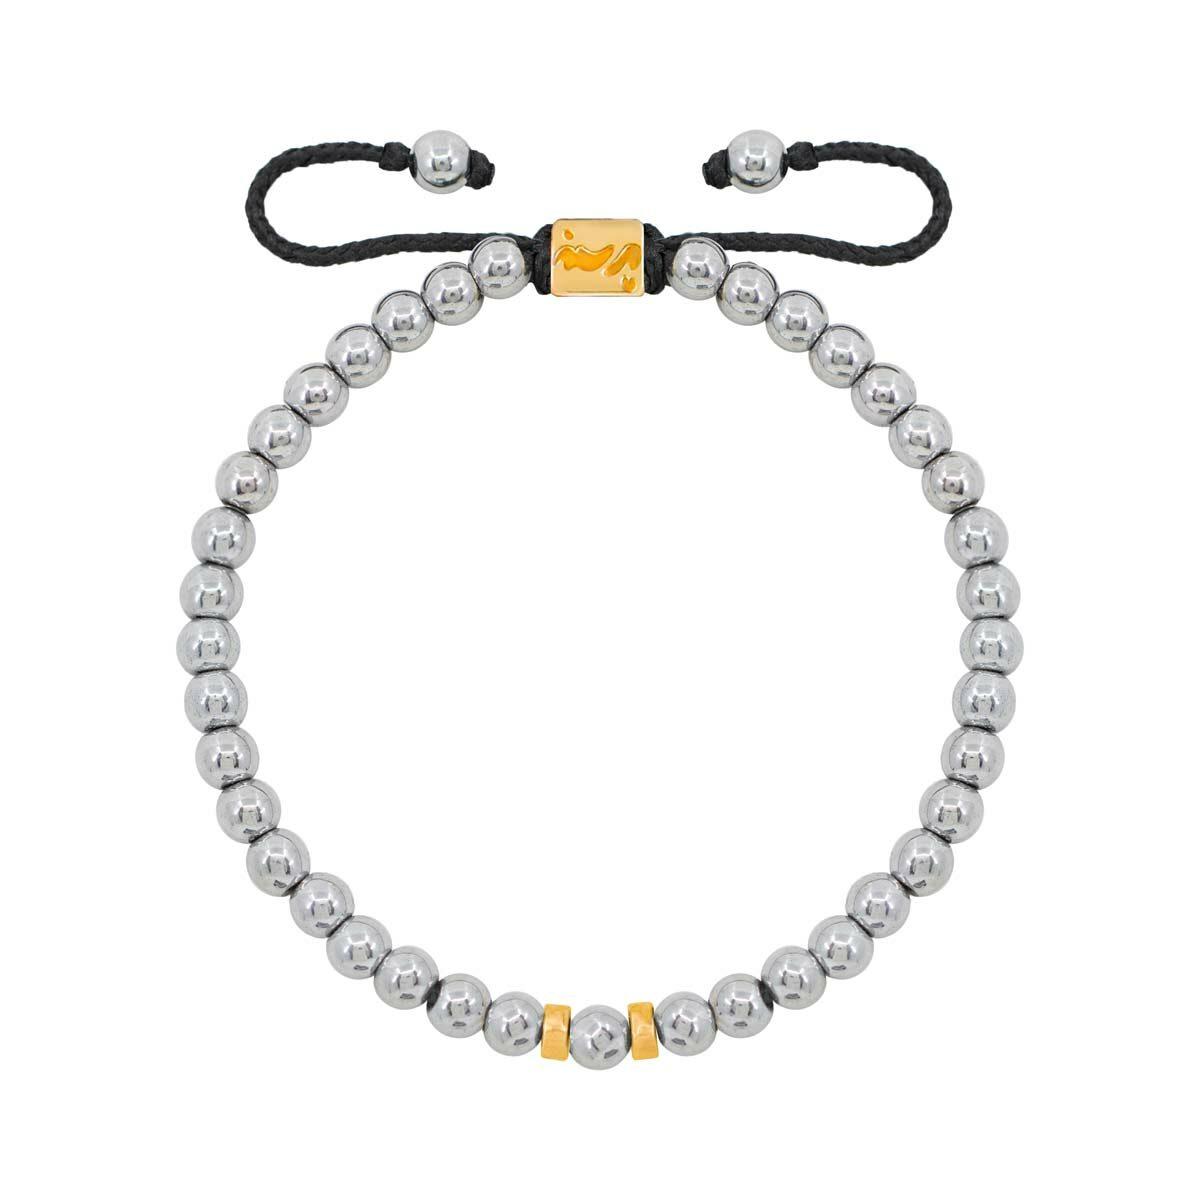 دستبند طلا دو مهره |parasteh